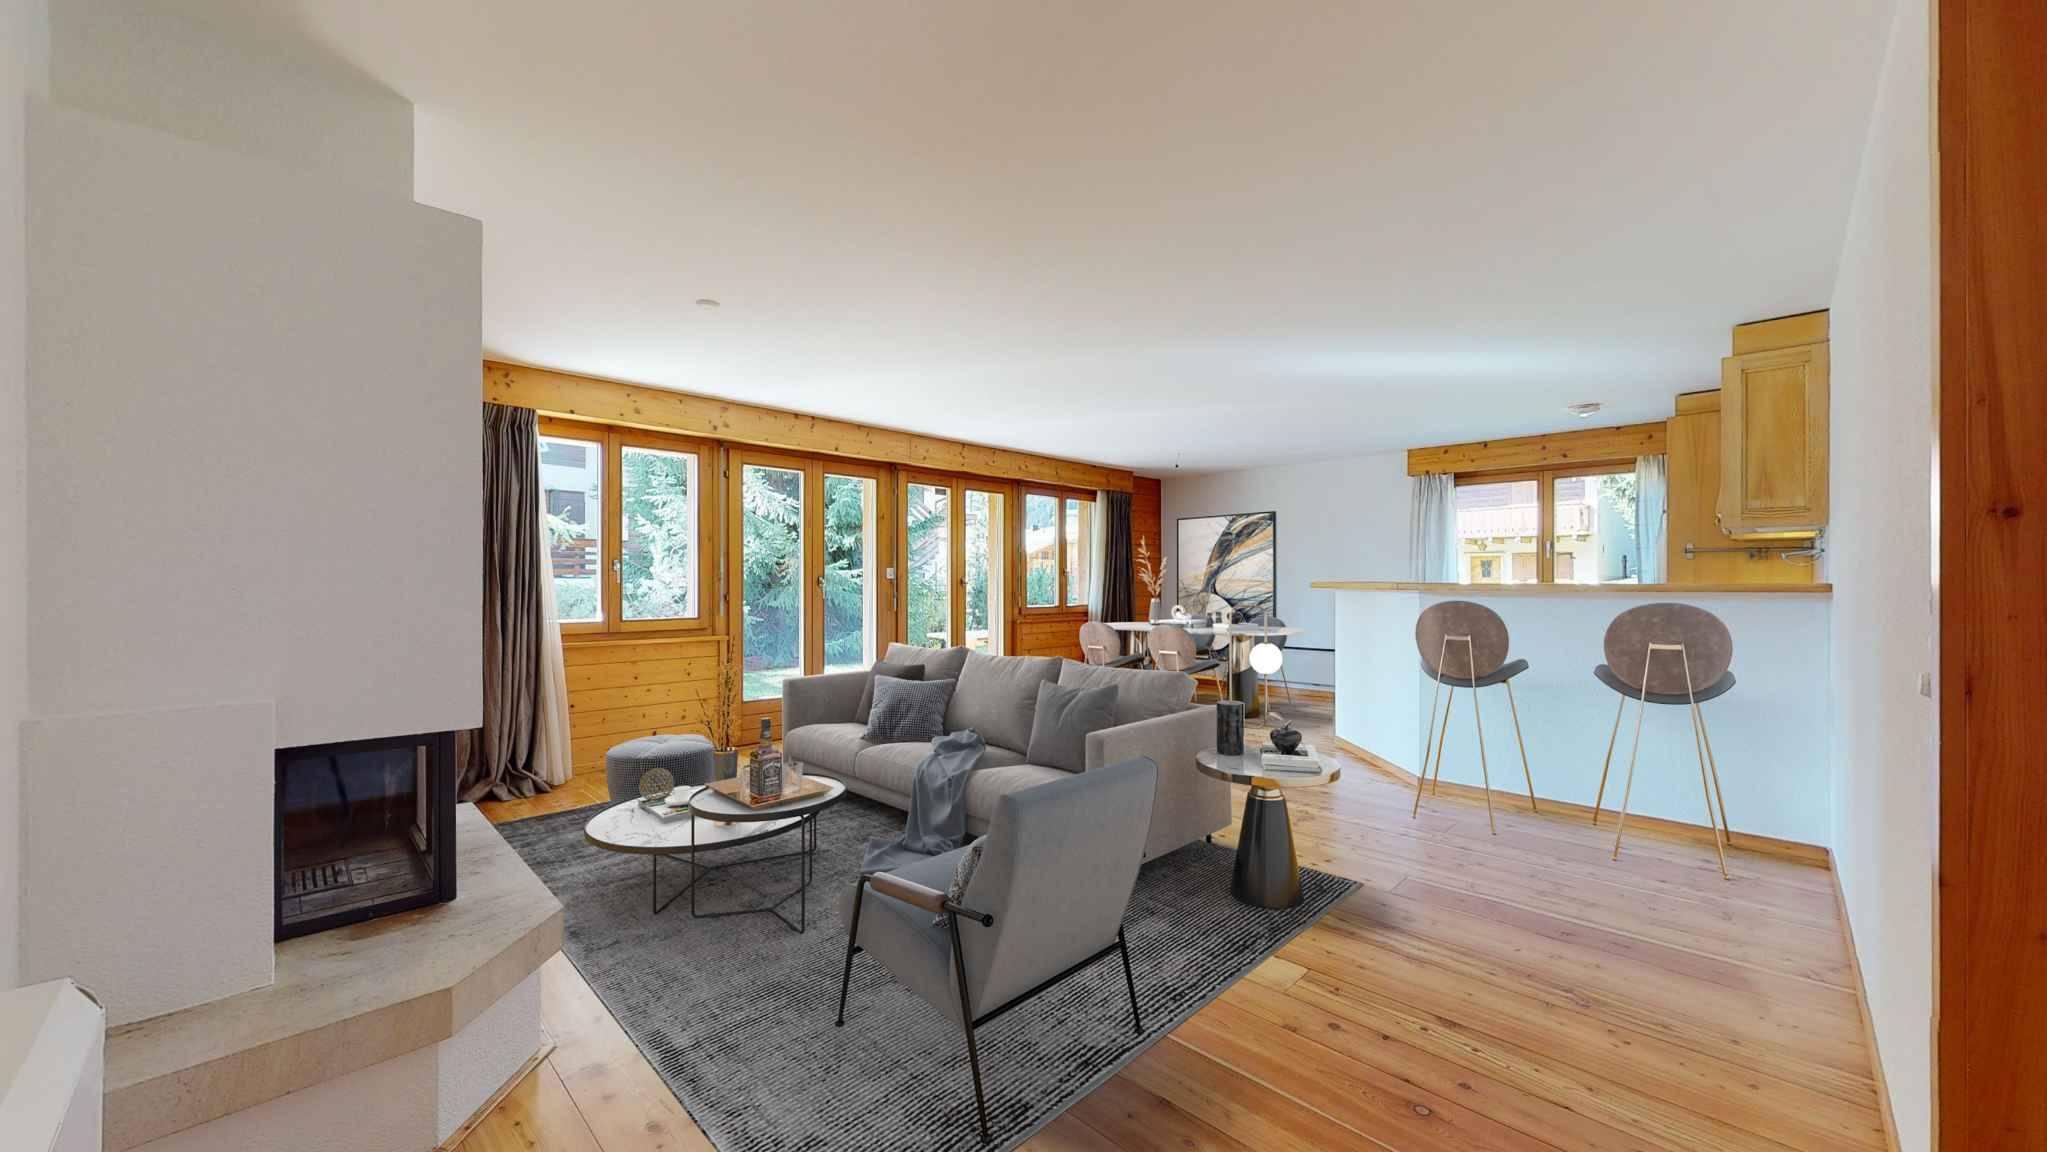 Corbettaz 001 - Splendid 2-bedroom apartment